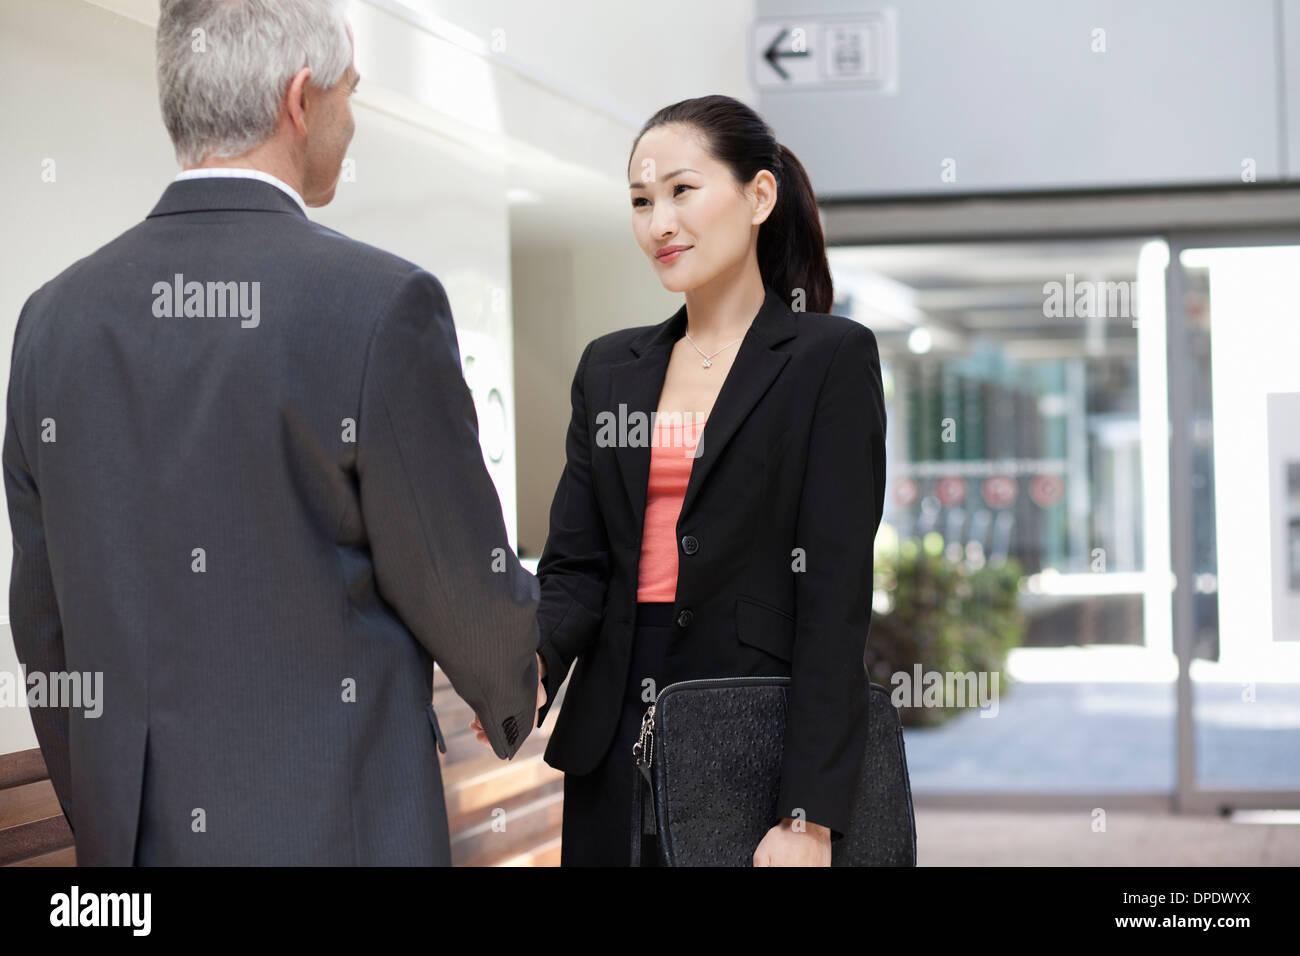 Businesspeople shaking hands - Stock Image